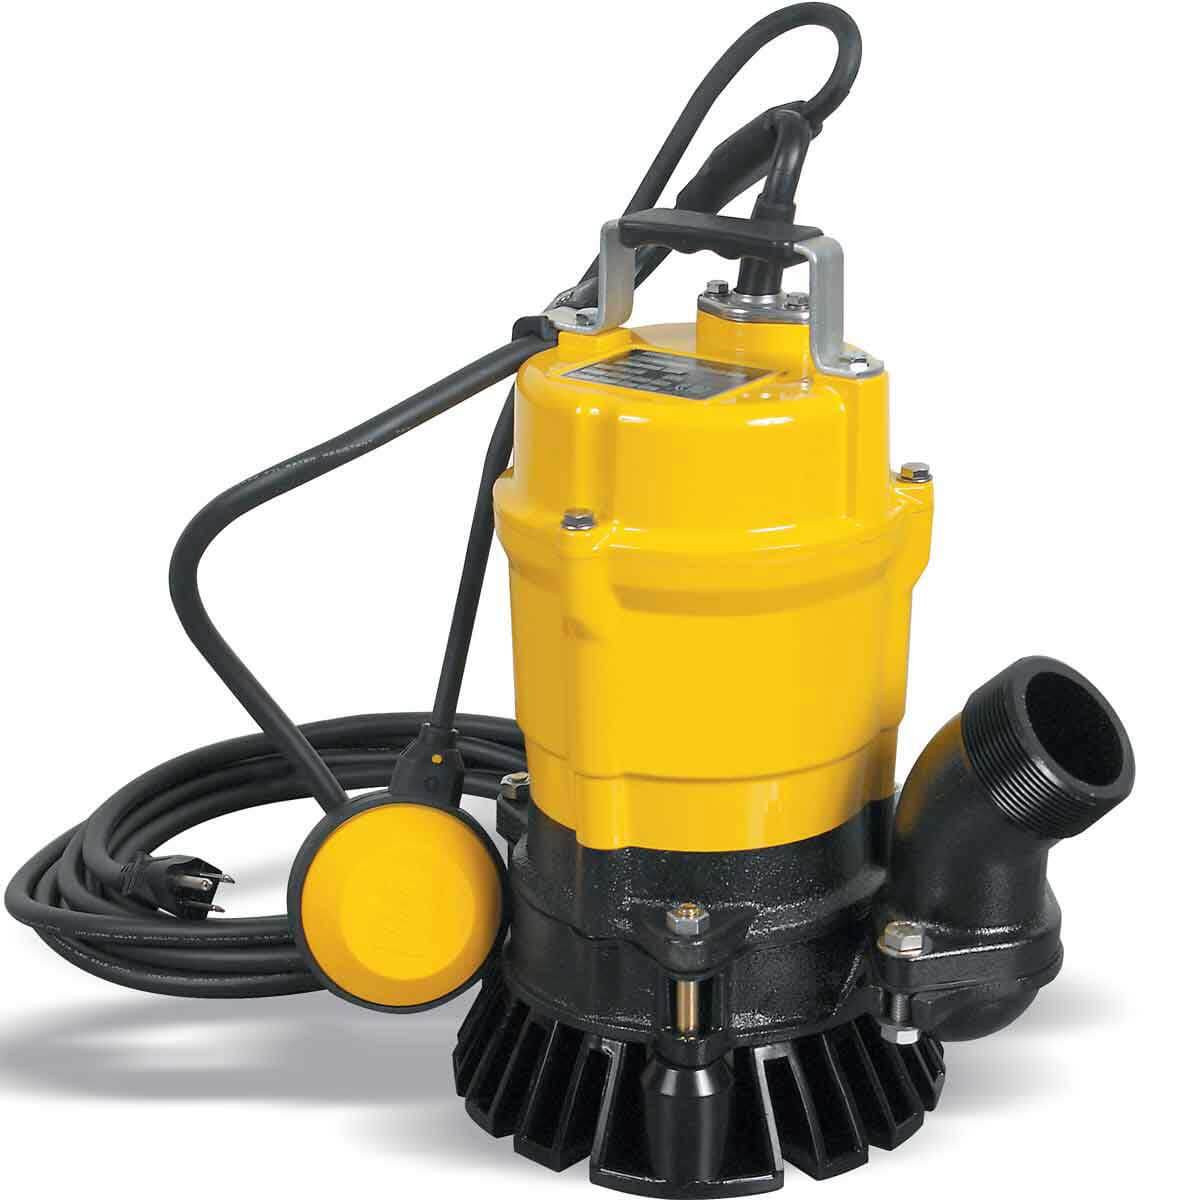 2 inch Wacker Neuson Submersible Pump 110V 5000620435